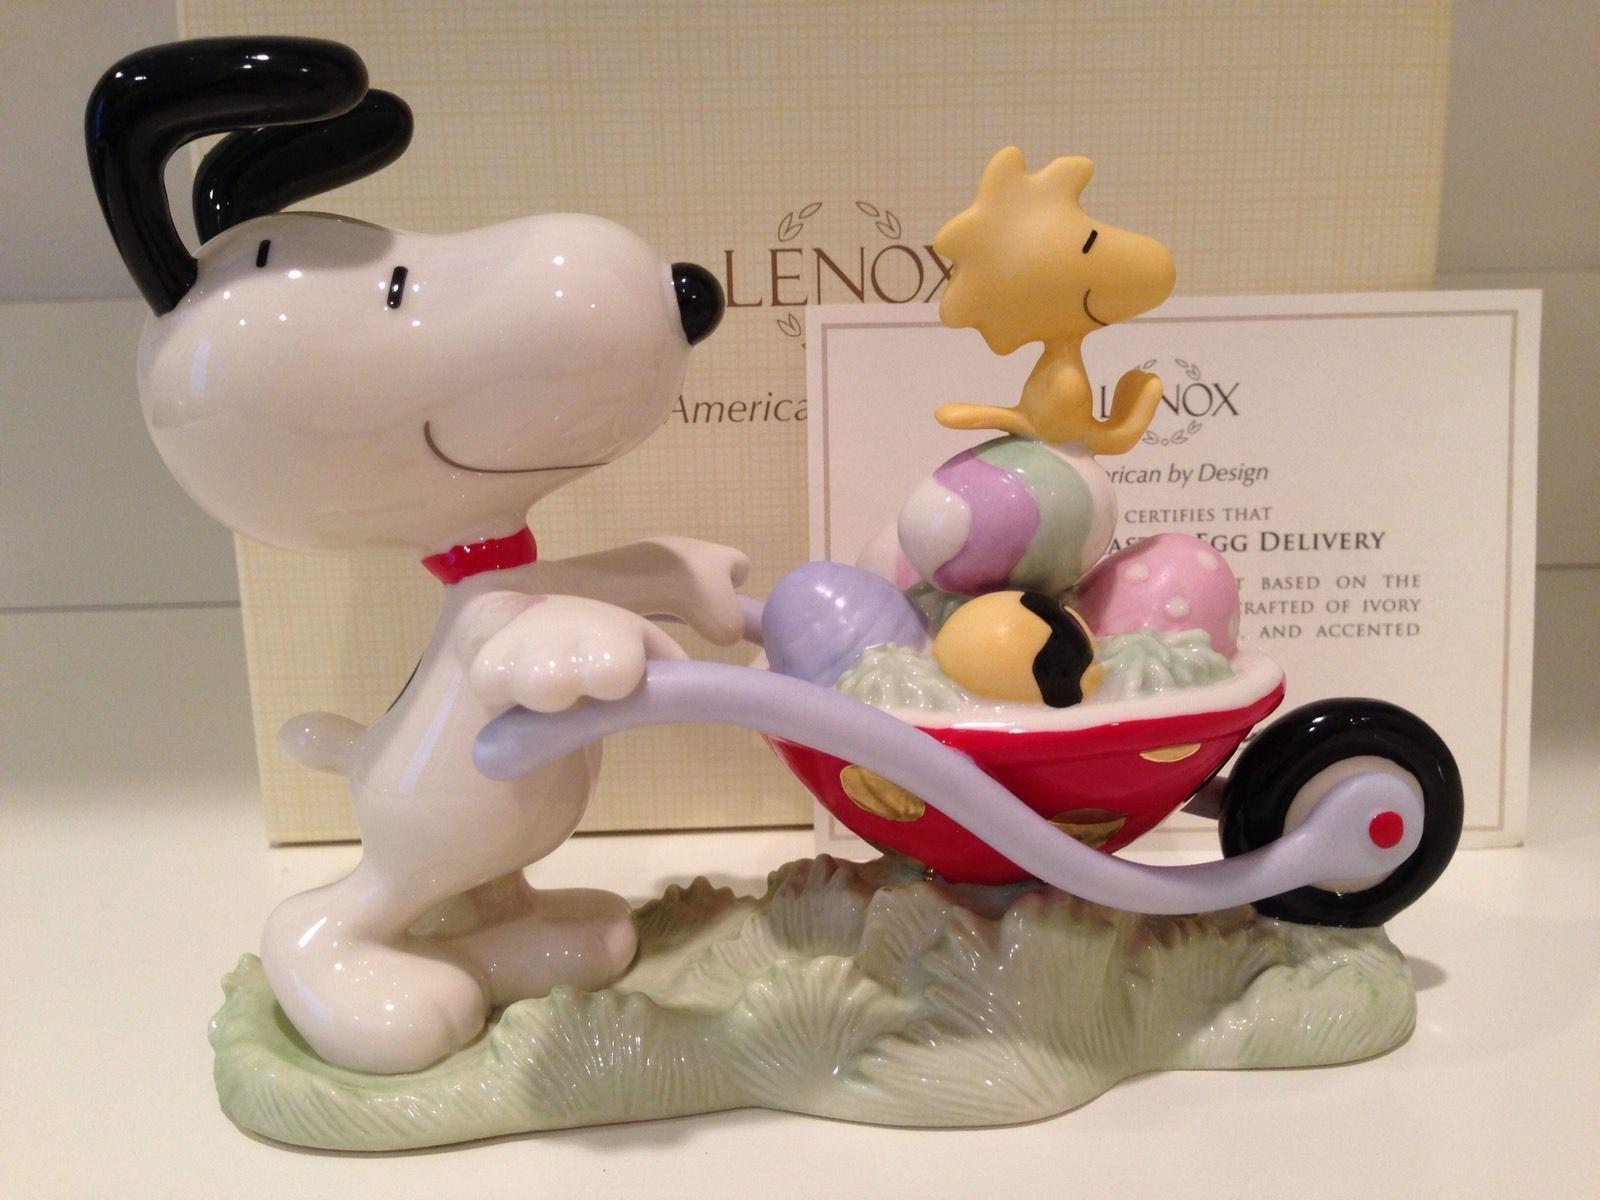 Lenox Peanuts Snoopy Easter Figurine Egg Delivery In Wheelbarrow Woodstock NEW